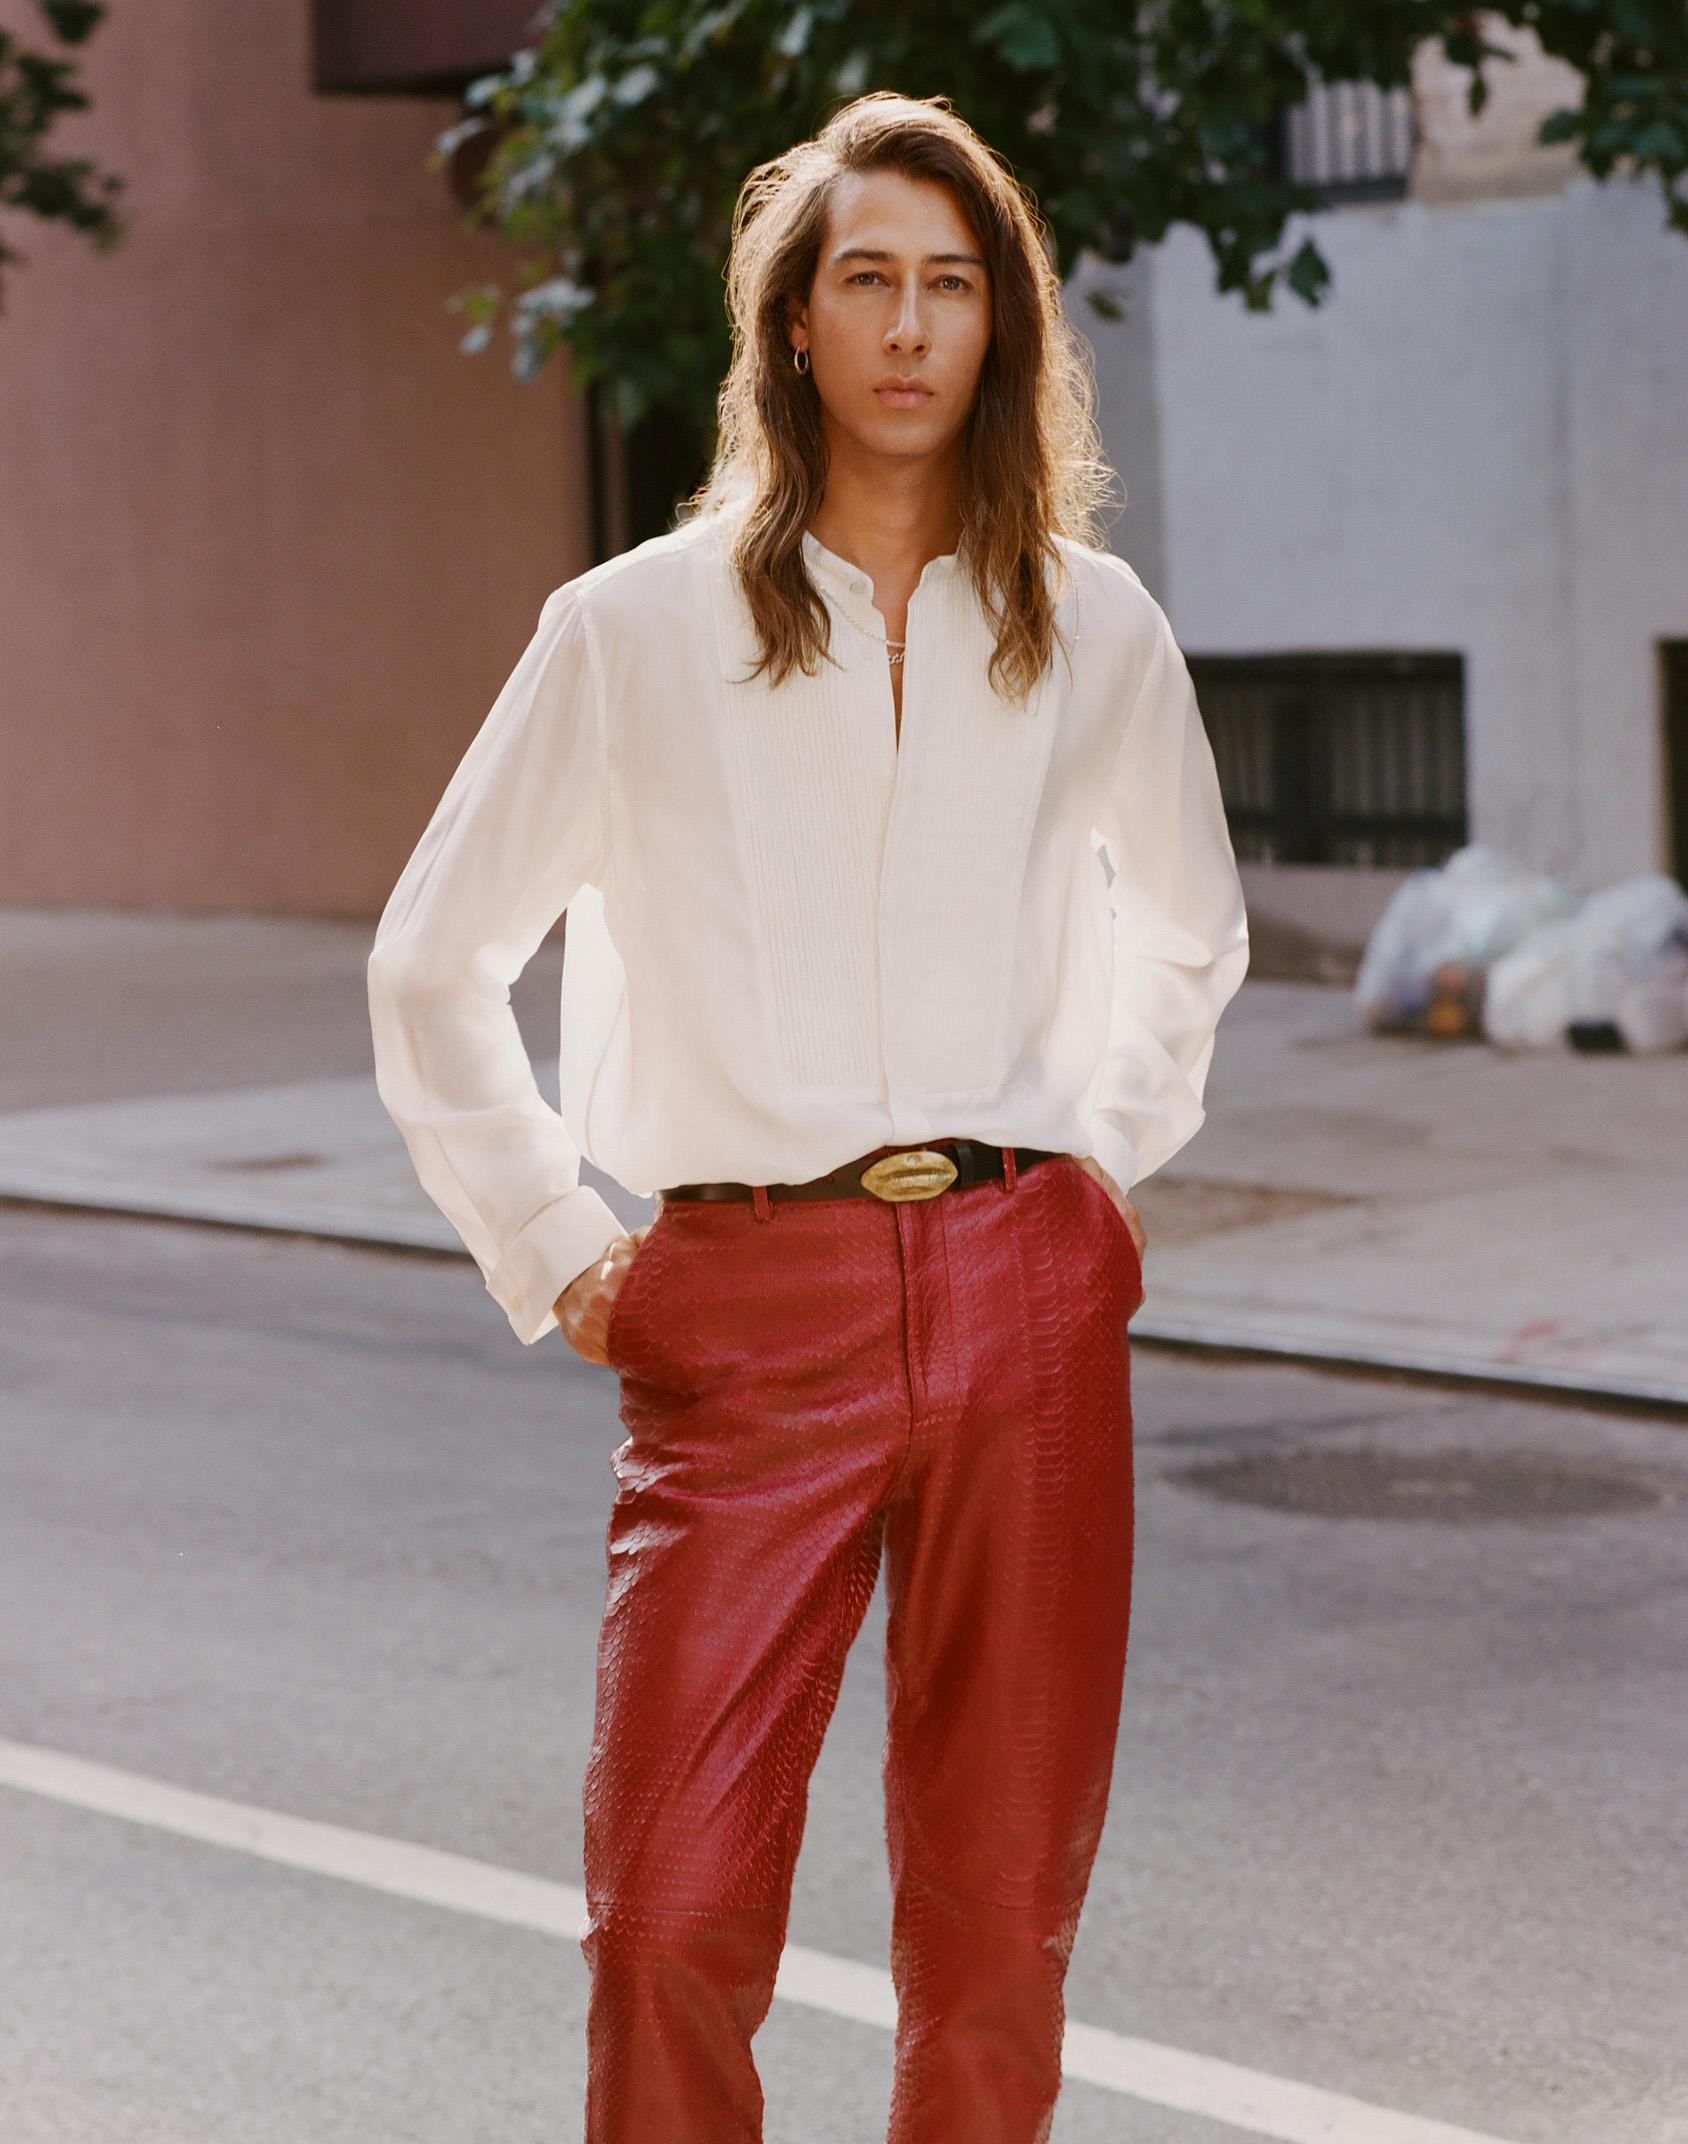 Kindness wearing GIAMBATTISTA VALLI x H&M white silk shirt and red leather pants.